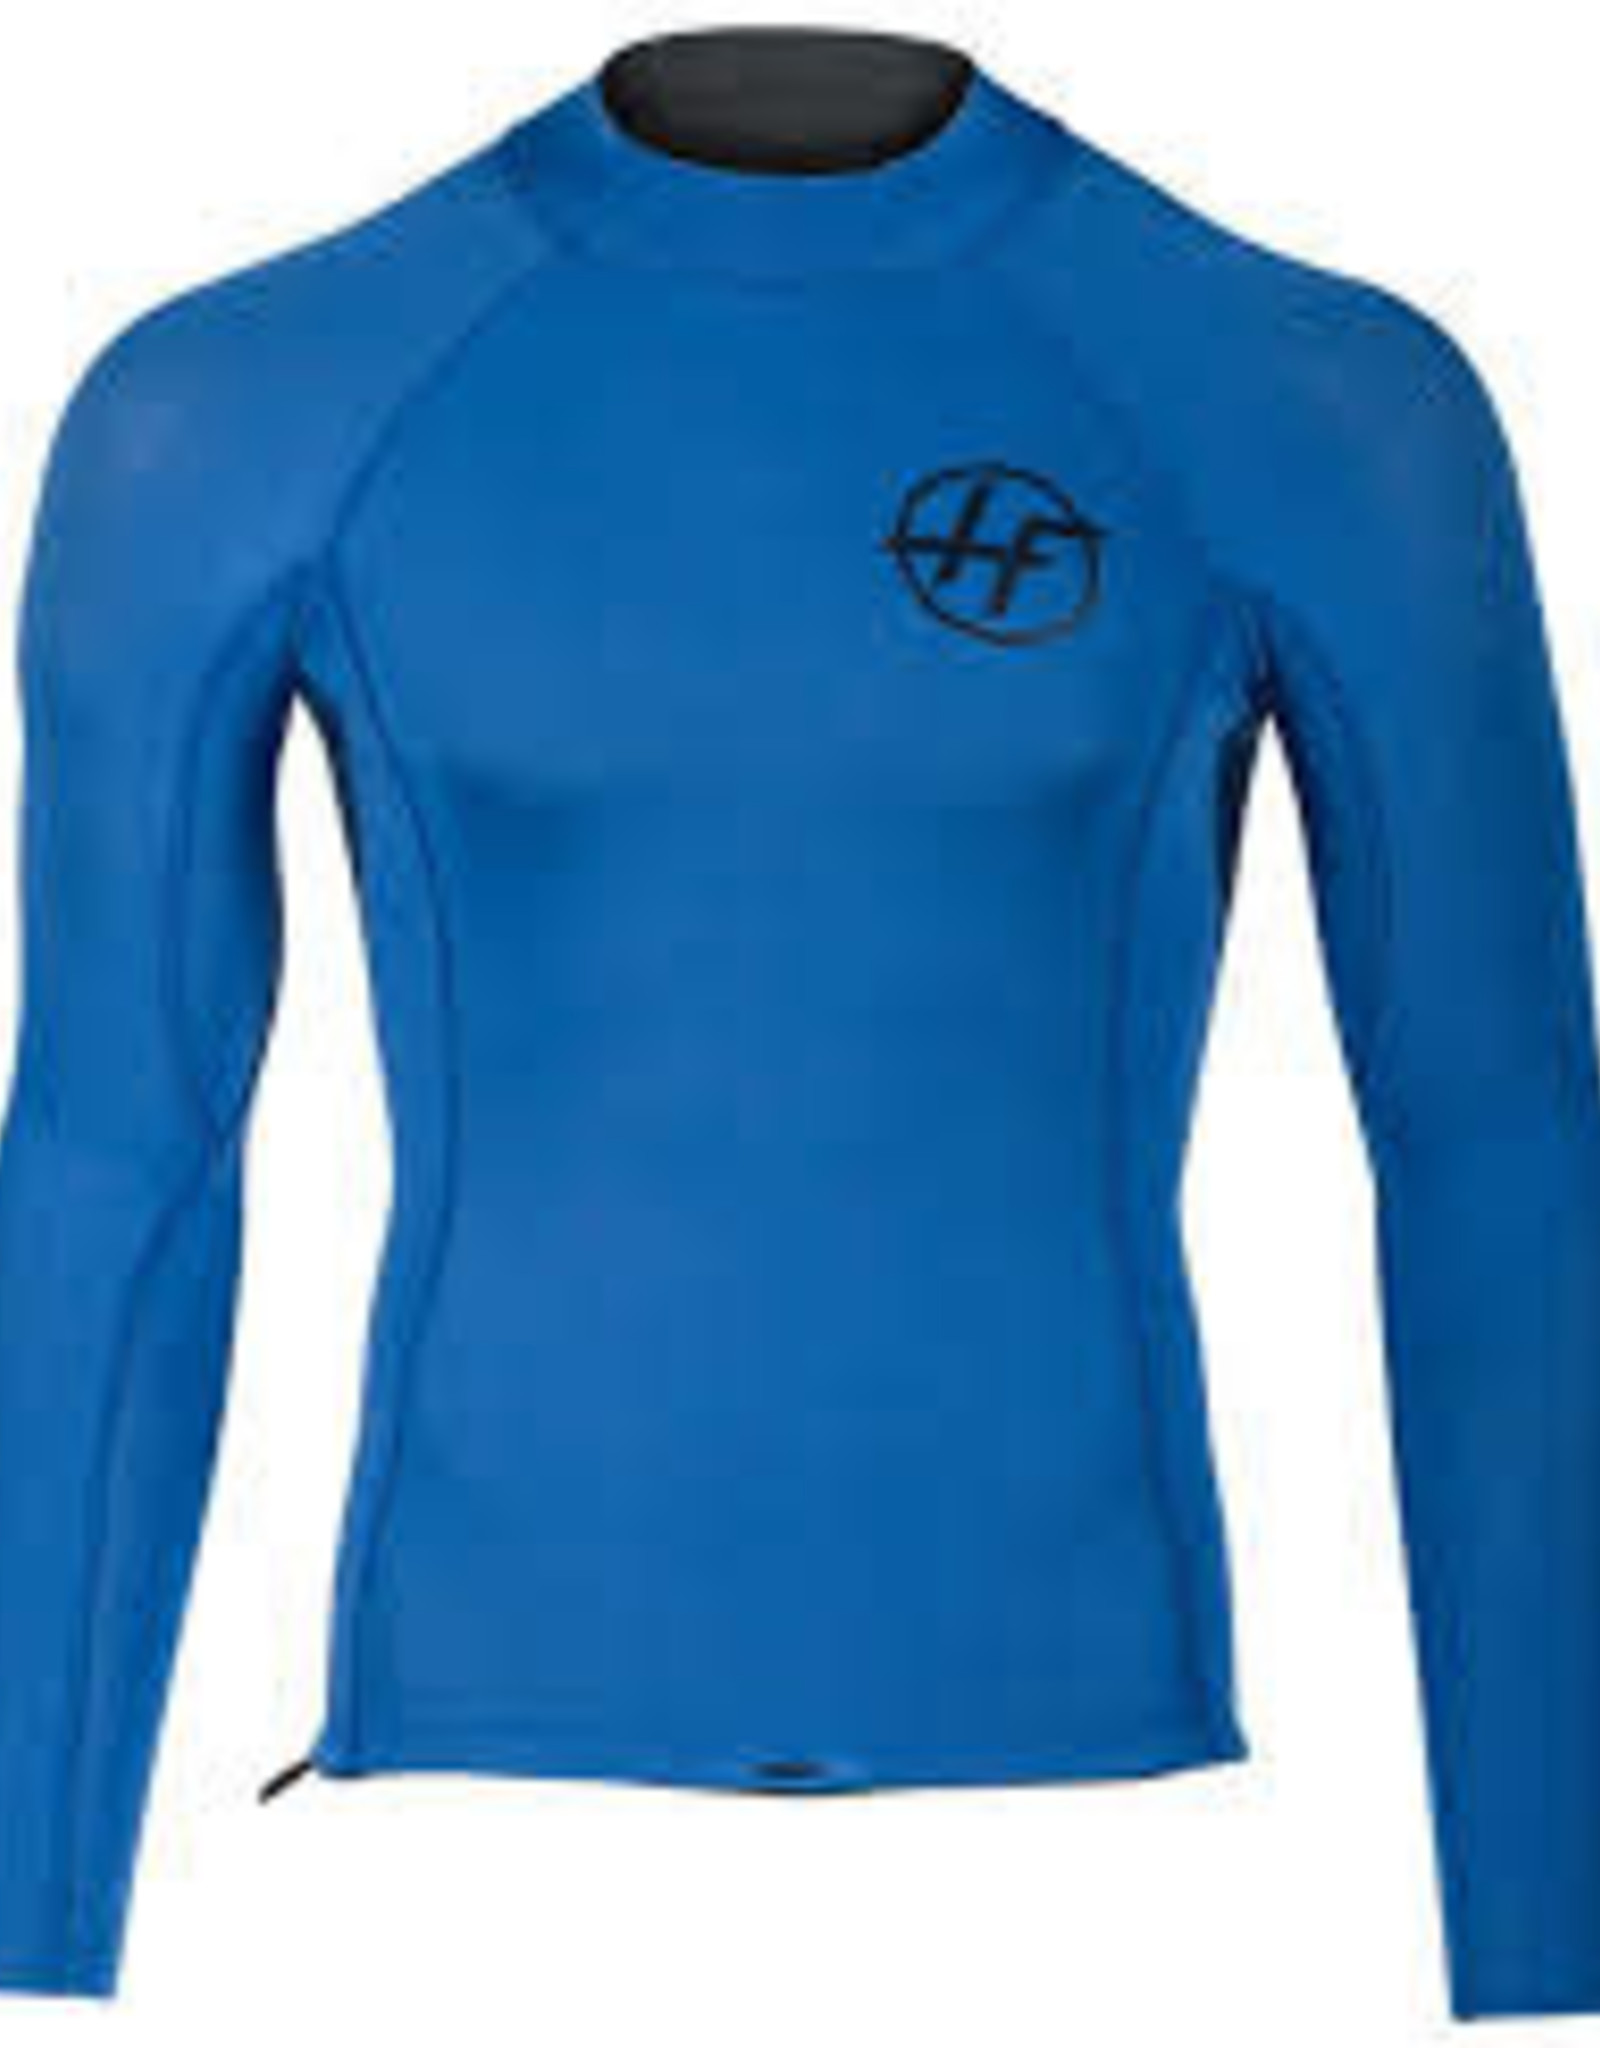 hyperflex Hyperflex Vyrl top ben gravy 1.5mm blue